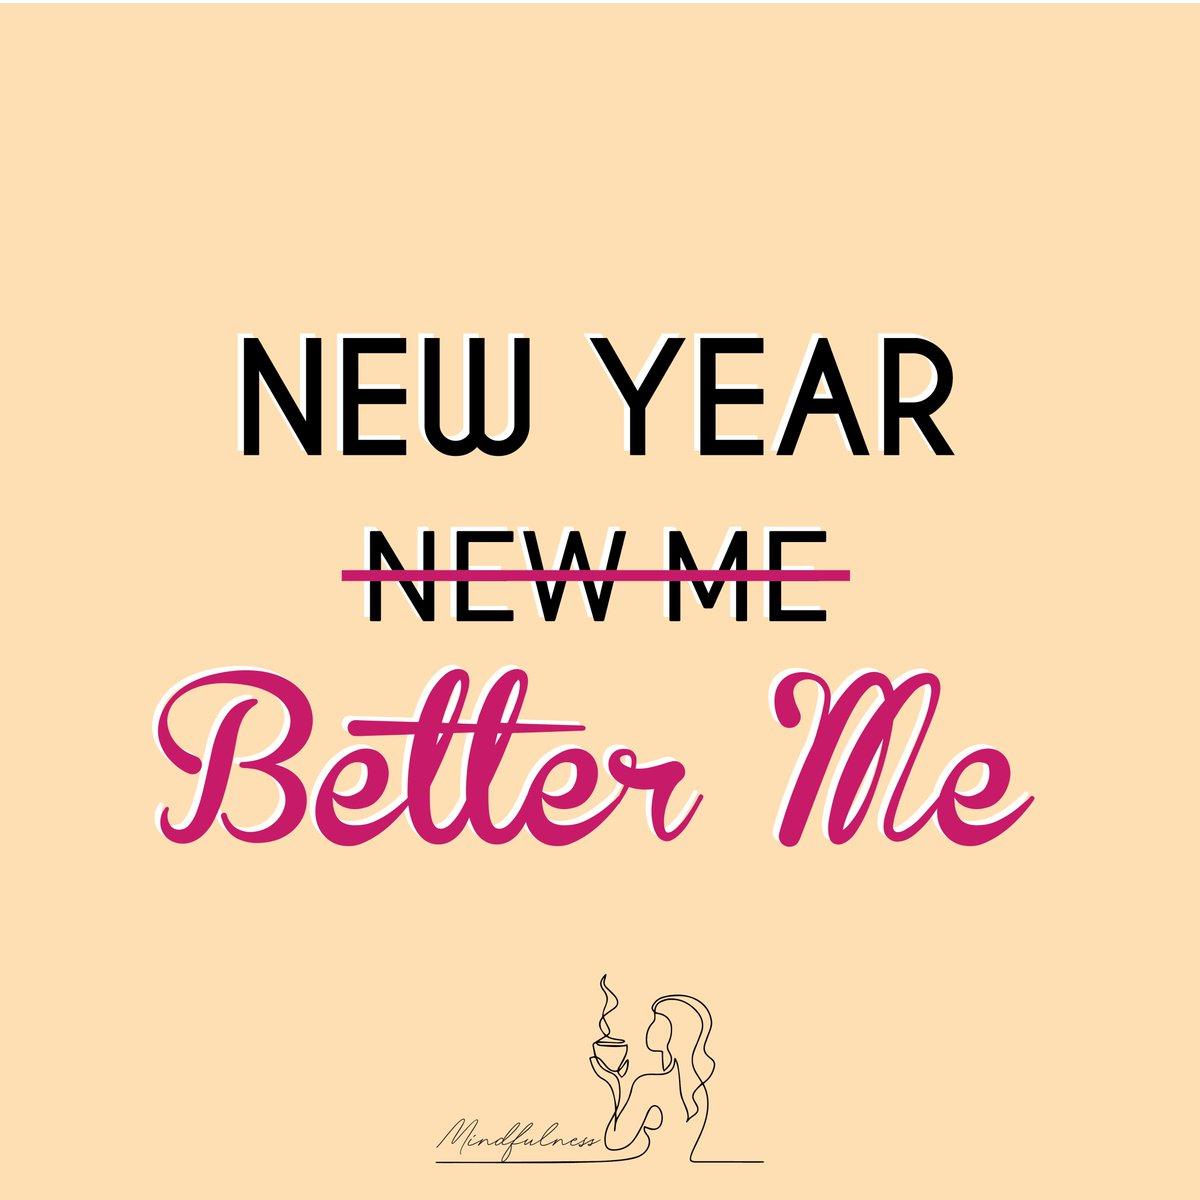 2021 - Be a better version of yourself!  كوني أفضل مما أنت عليه الآن في عام 2021 https://t.co/9NzvFNeTGV